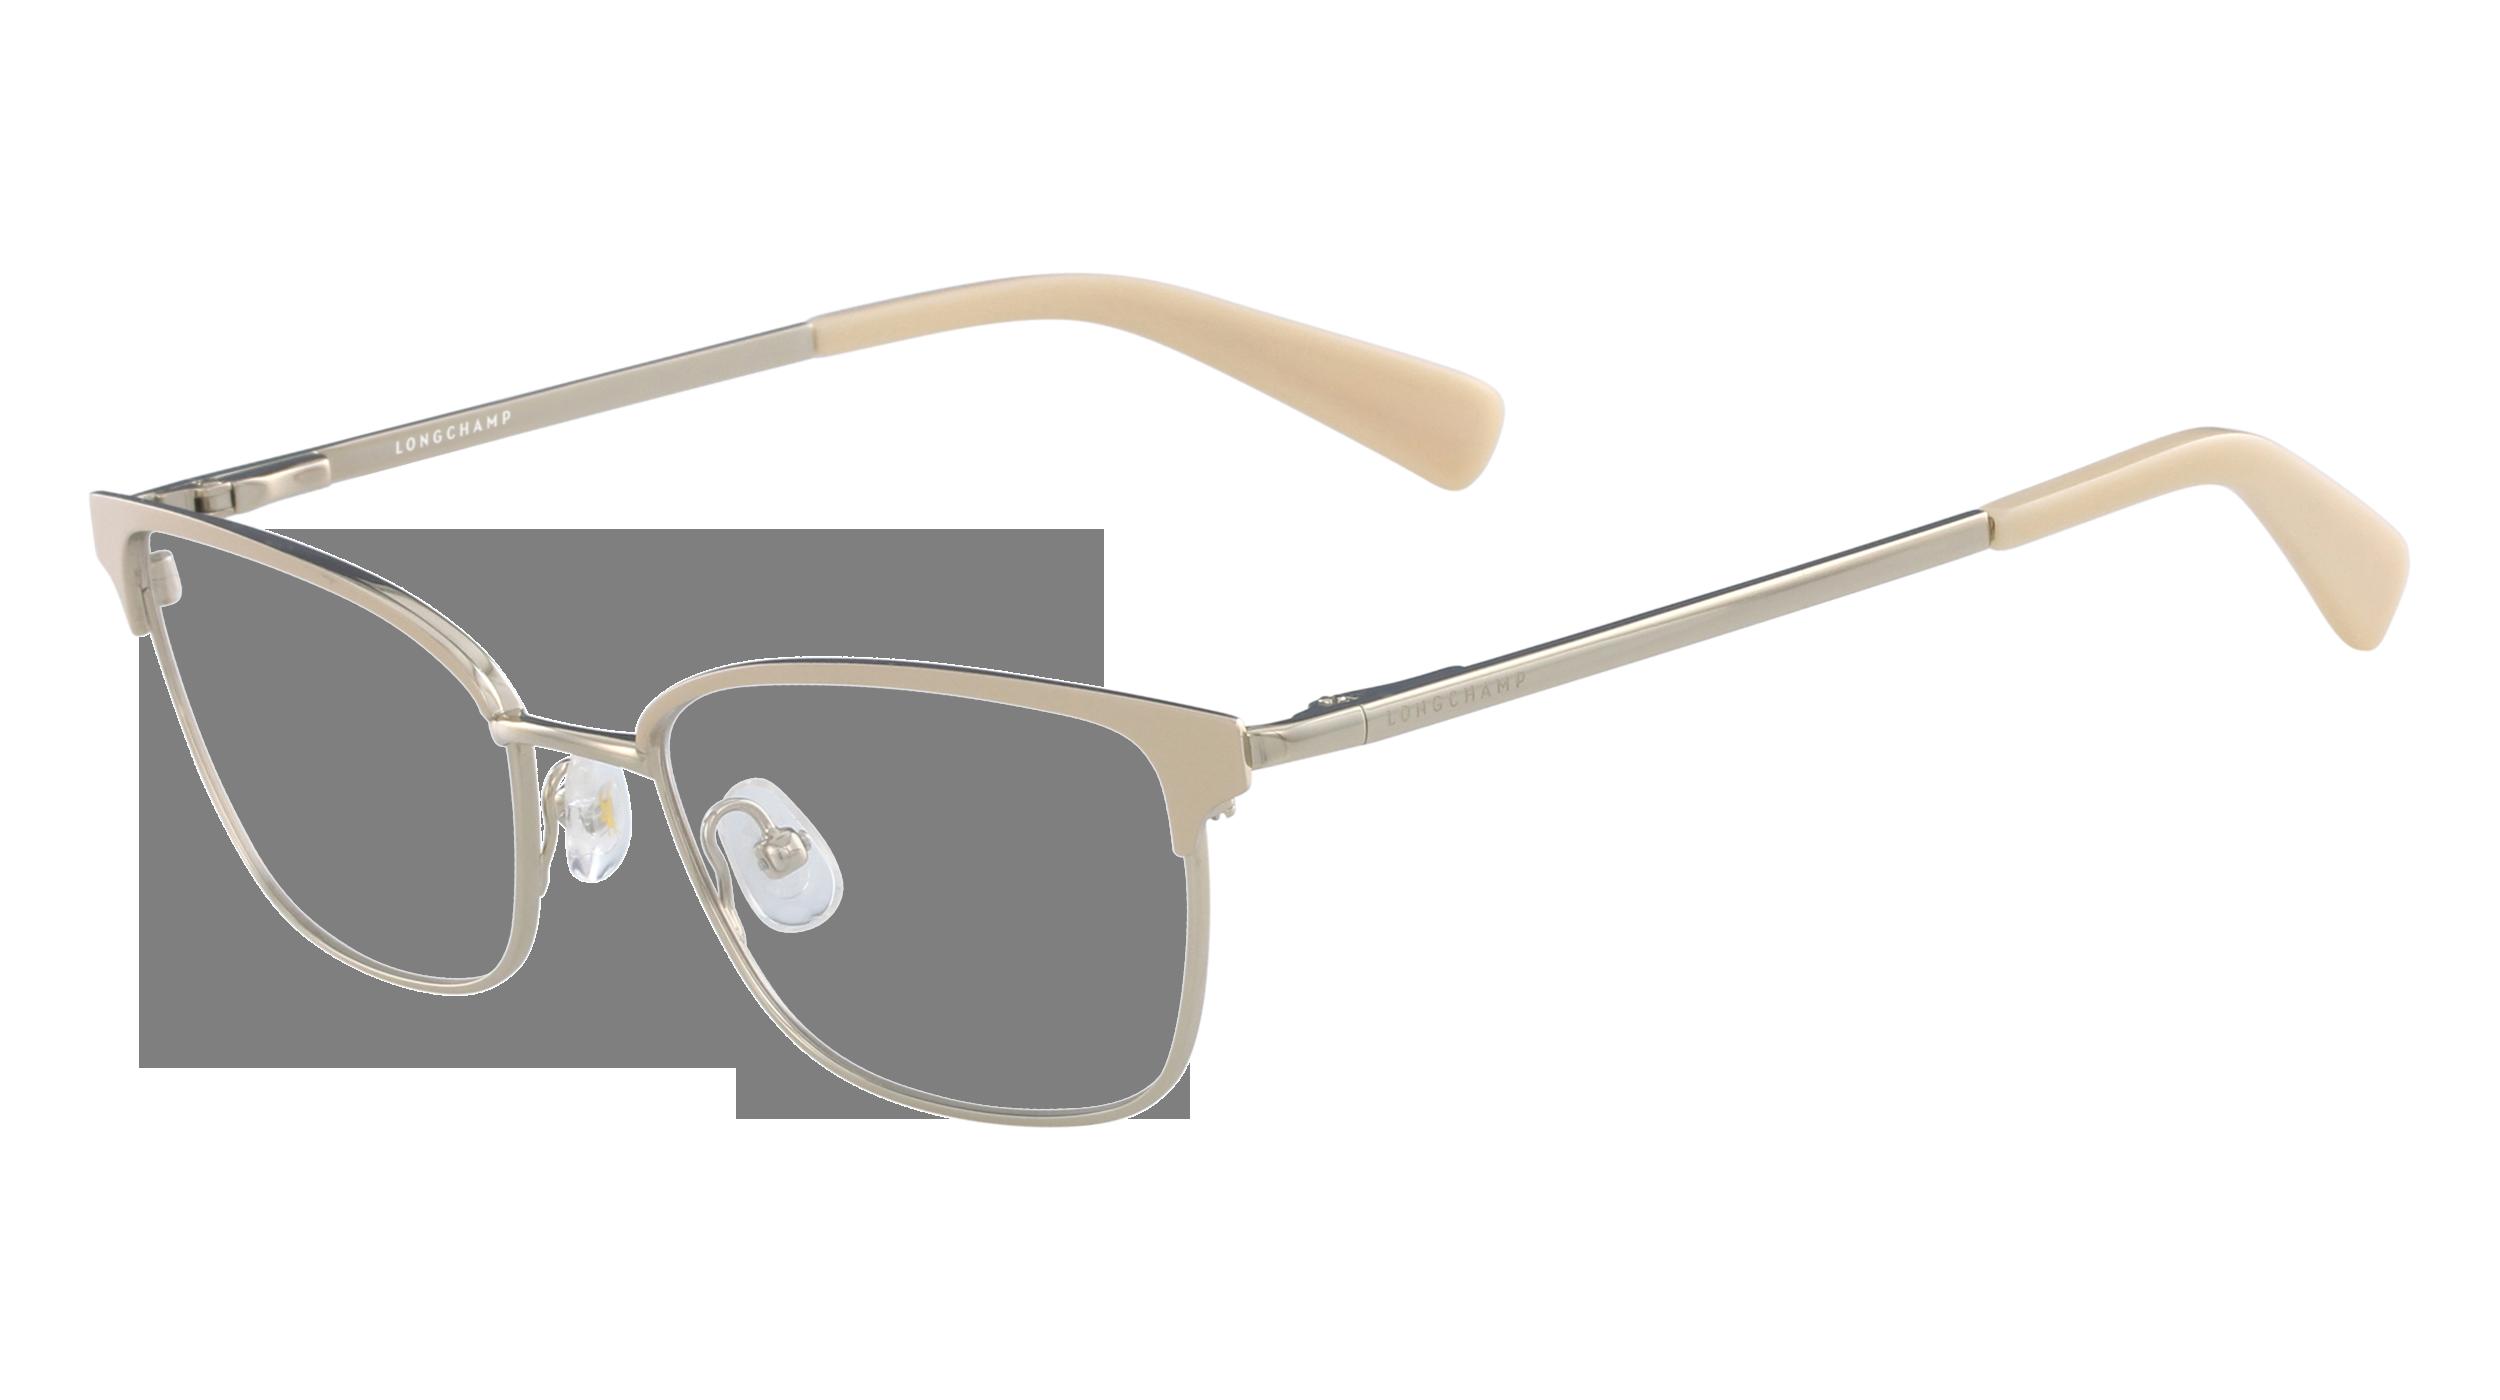 longchamp product imagery